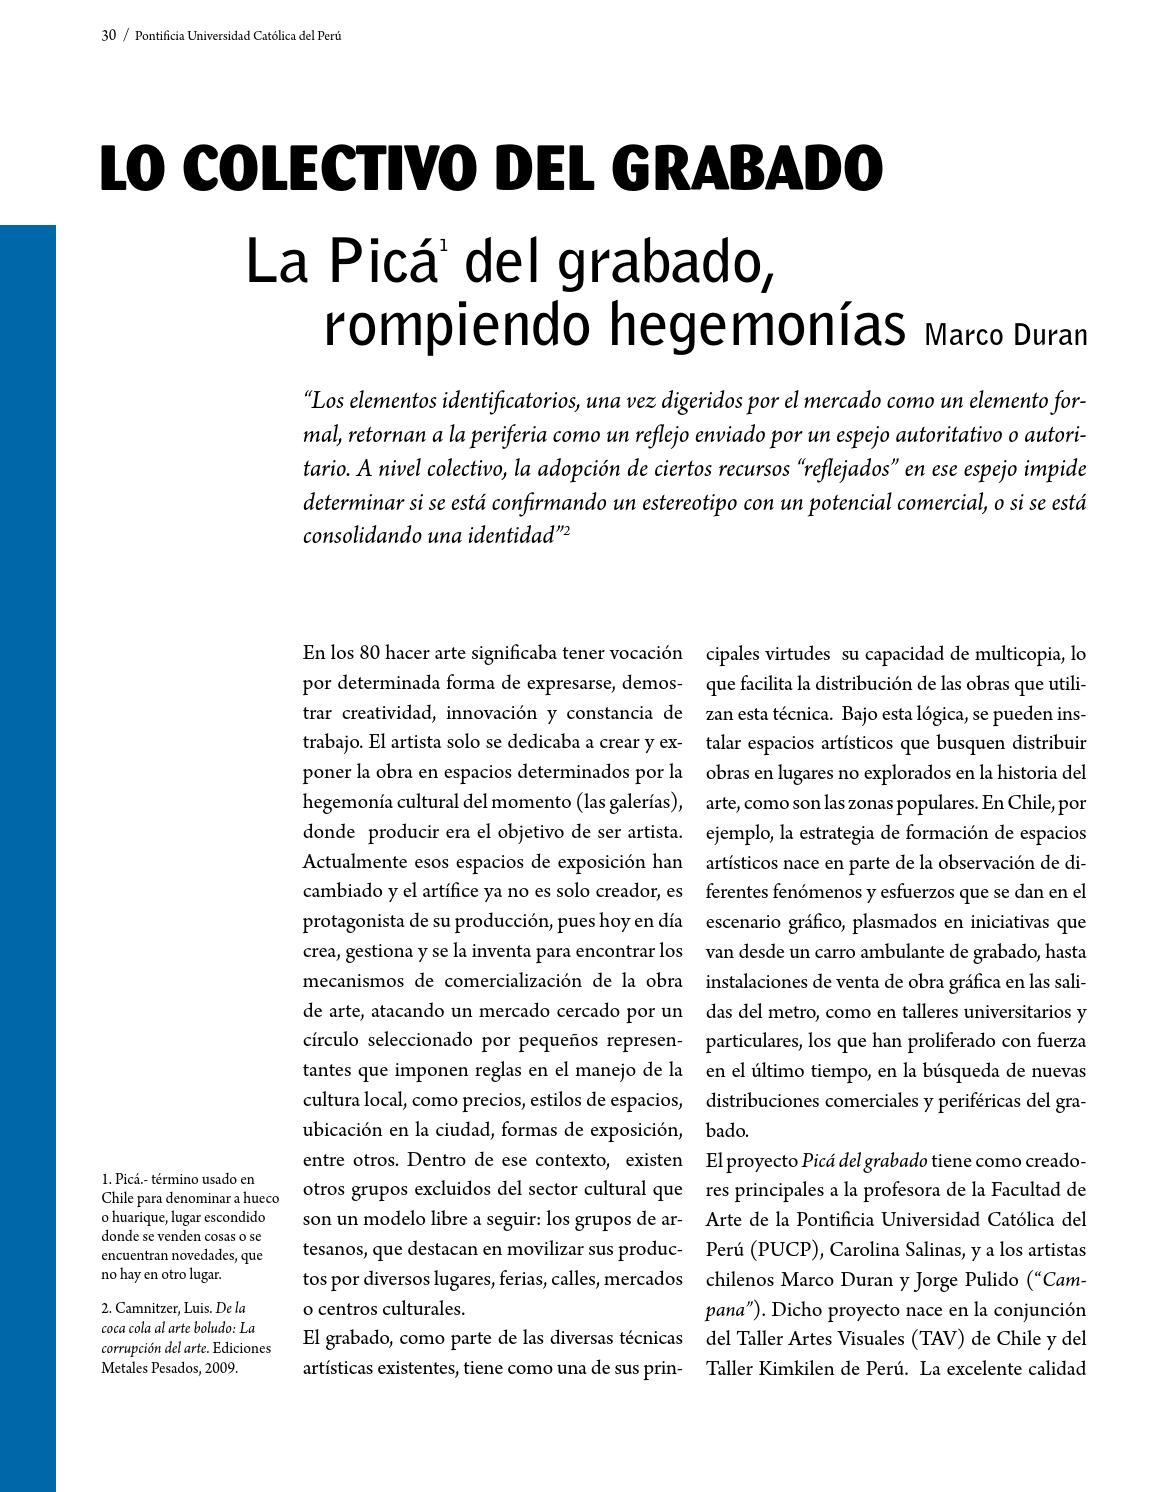 Revista Rinoceronte nº 4 by Taller de Grabado - issuu